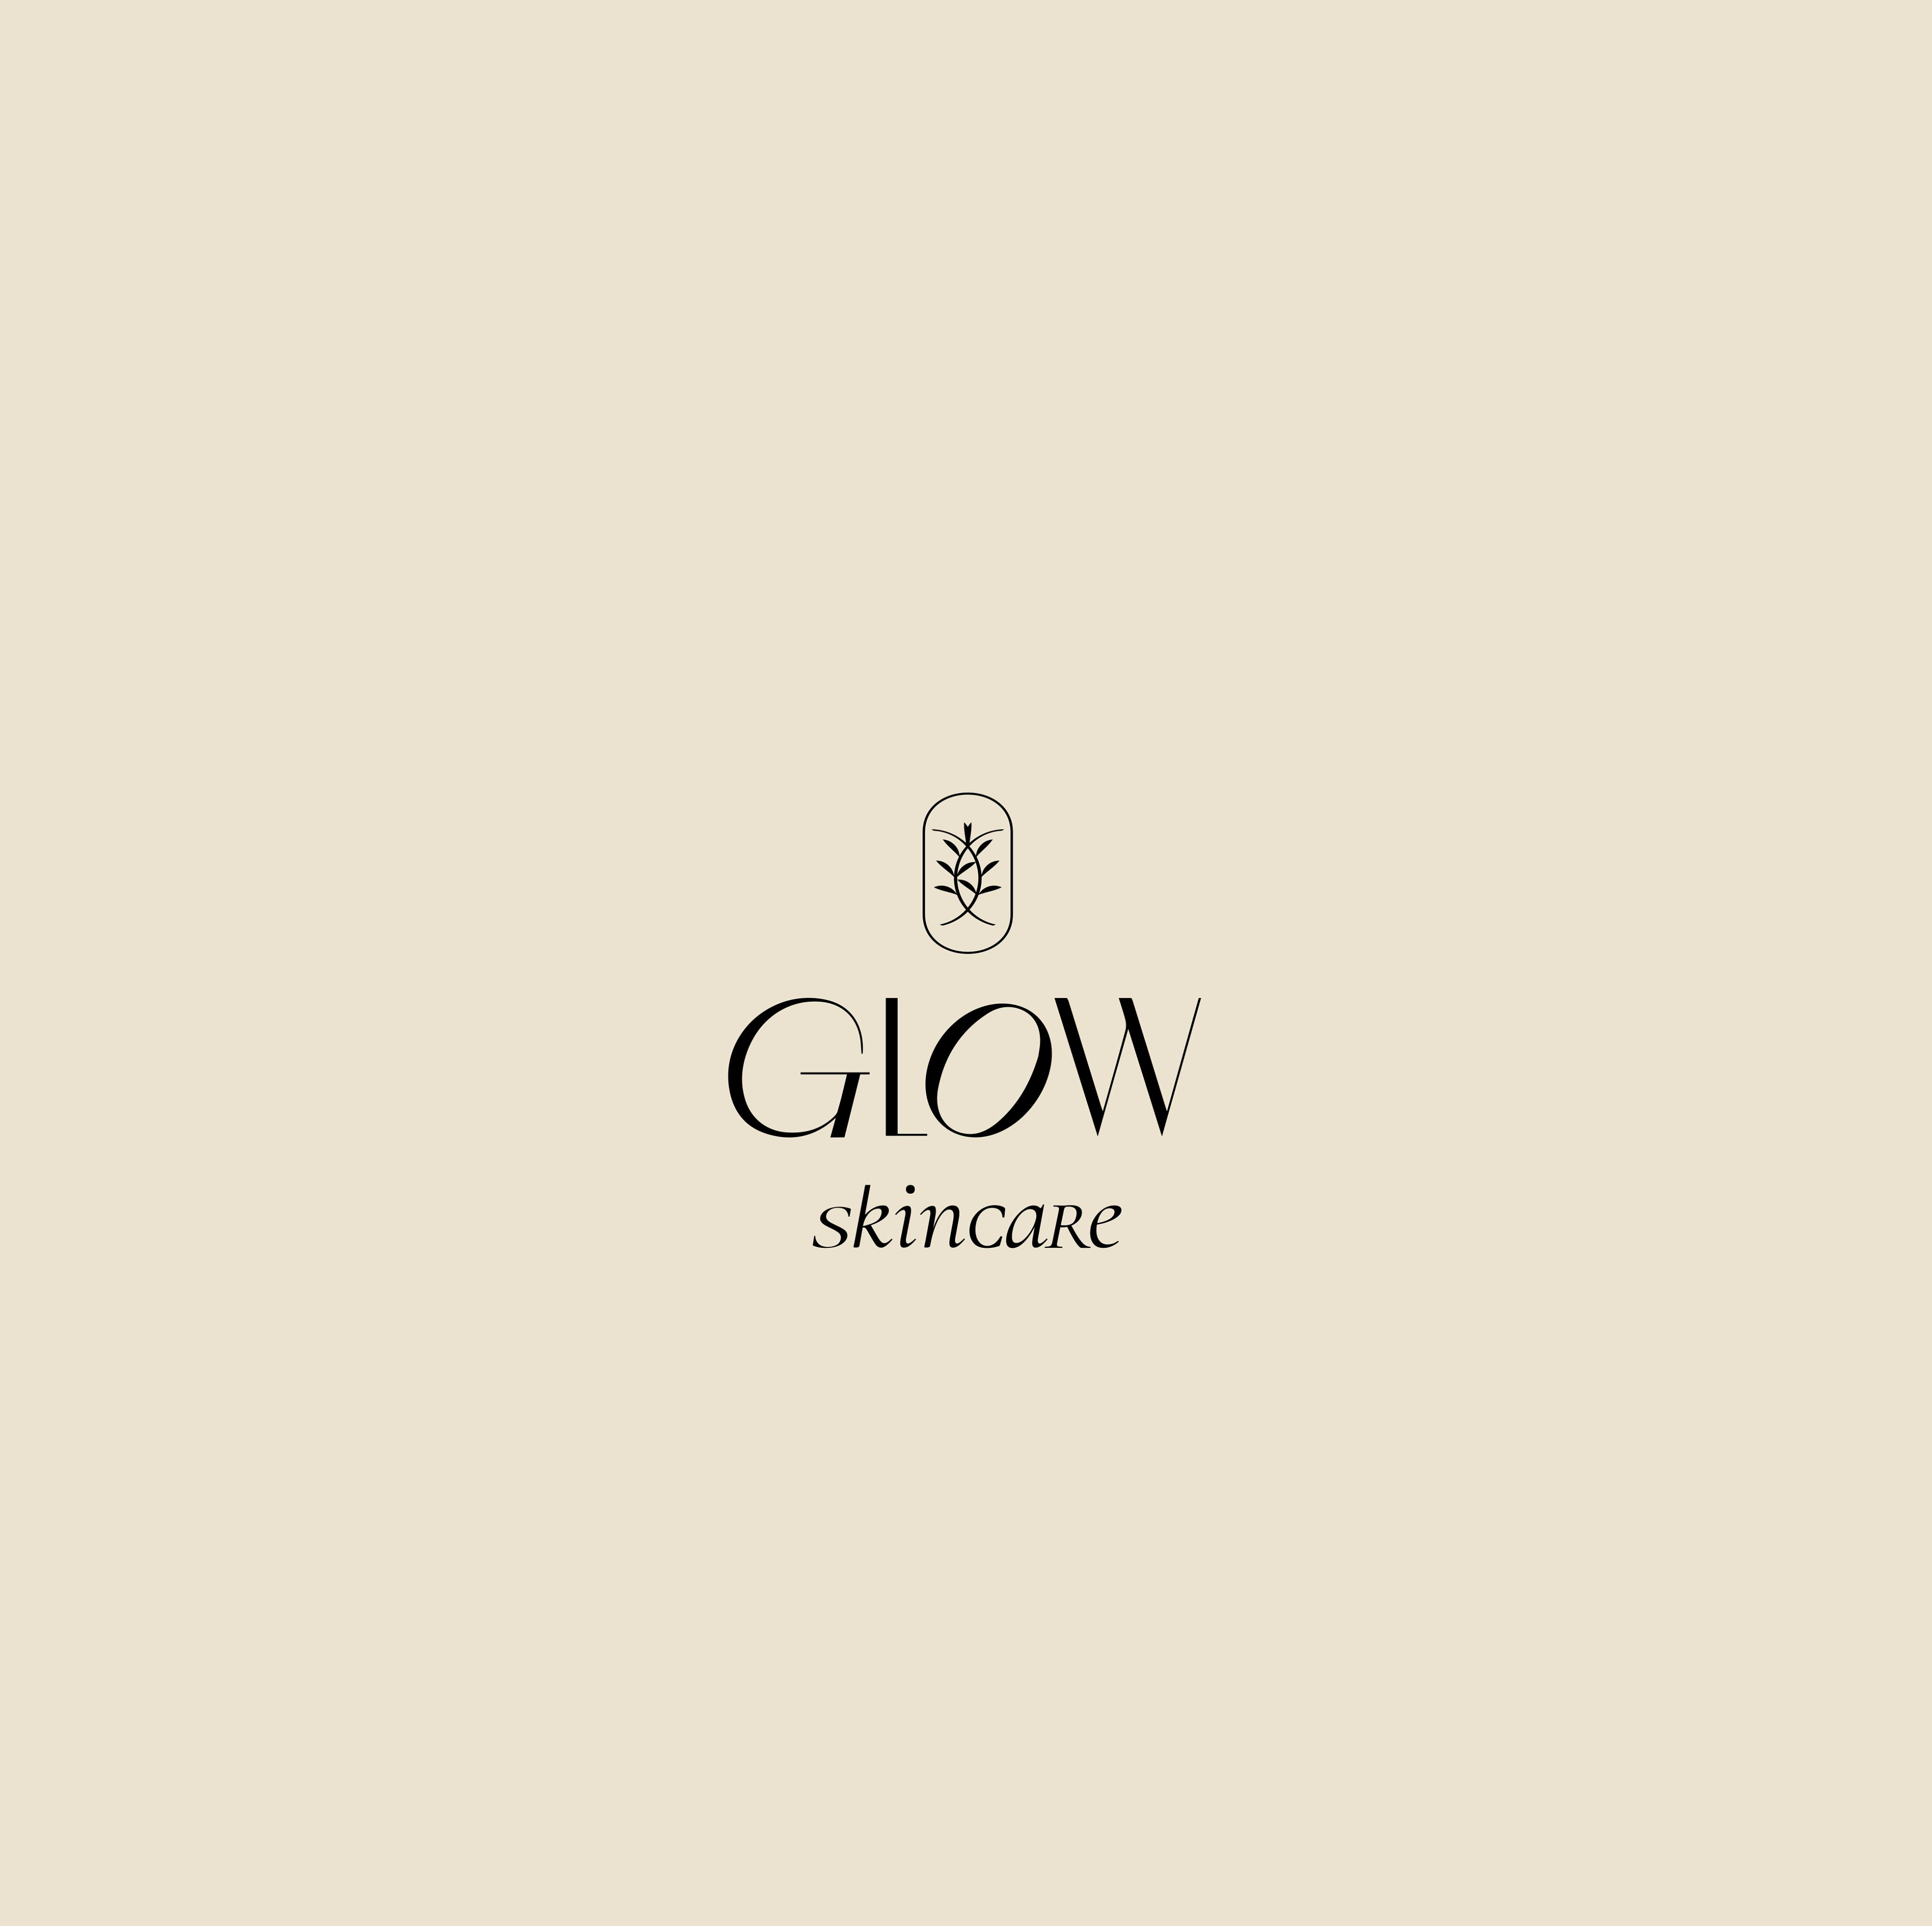 Glow skincare logo